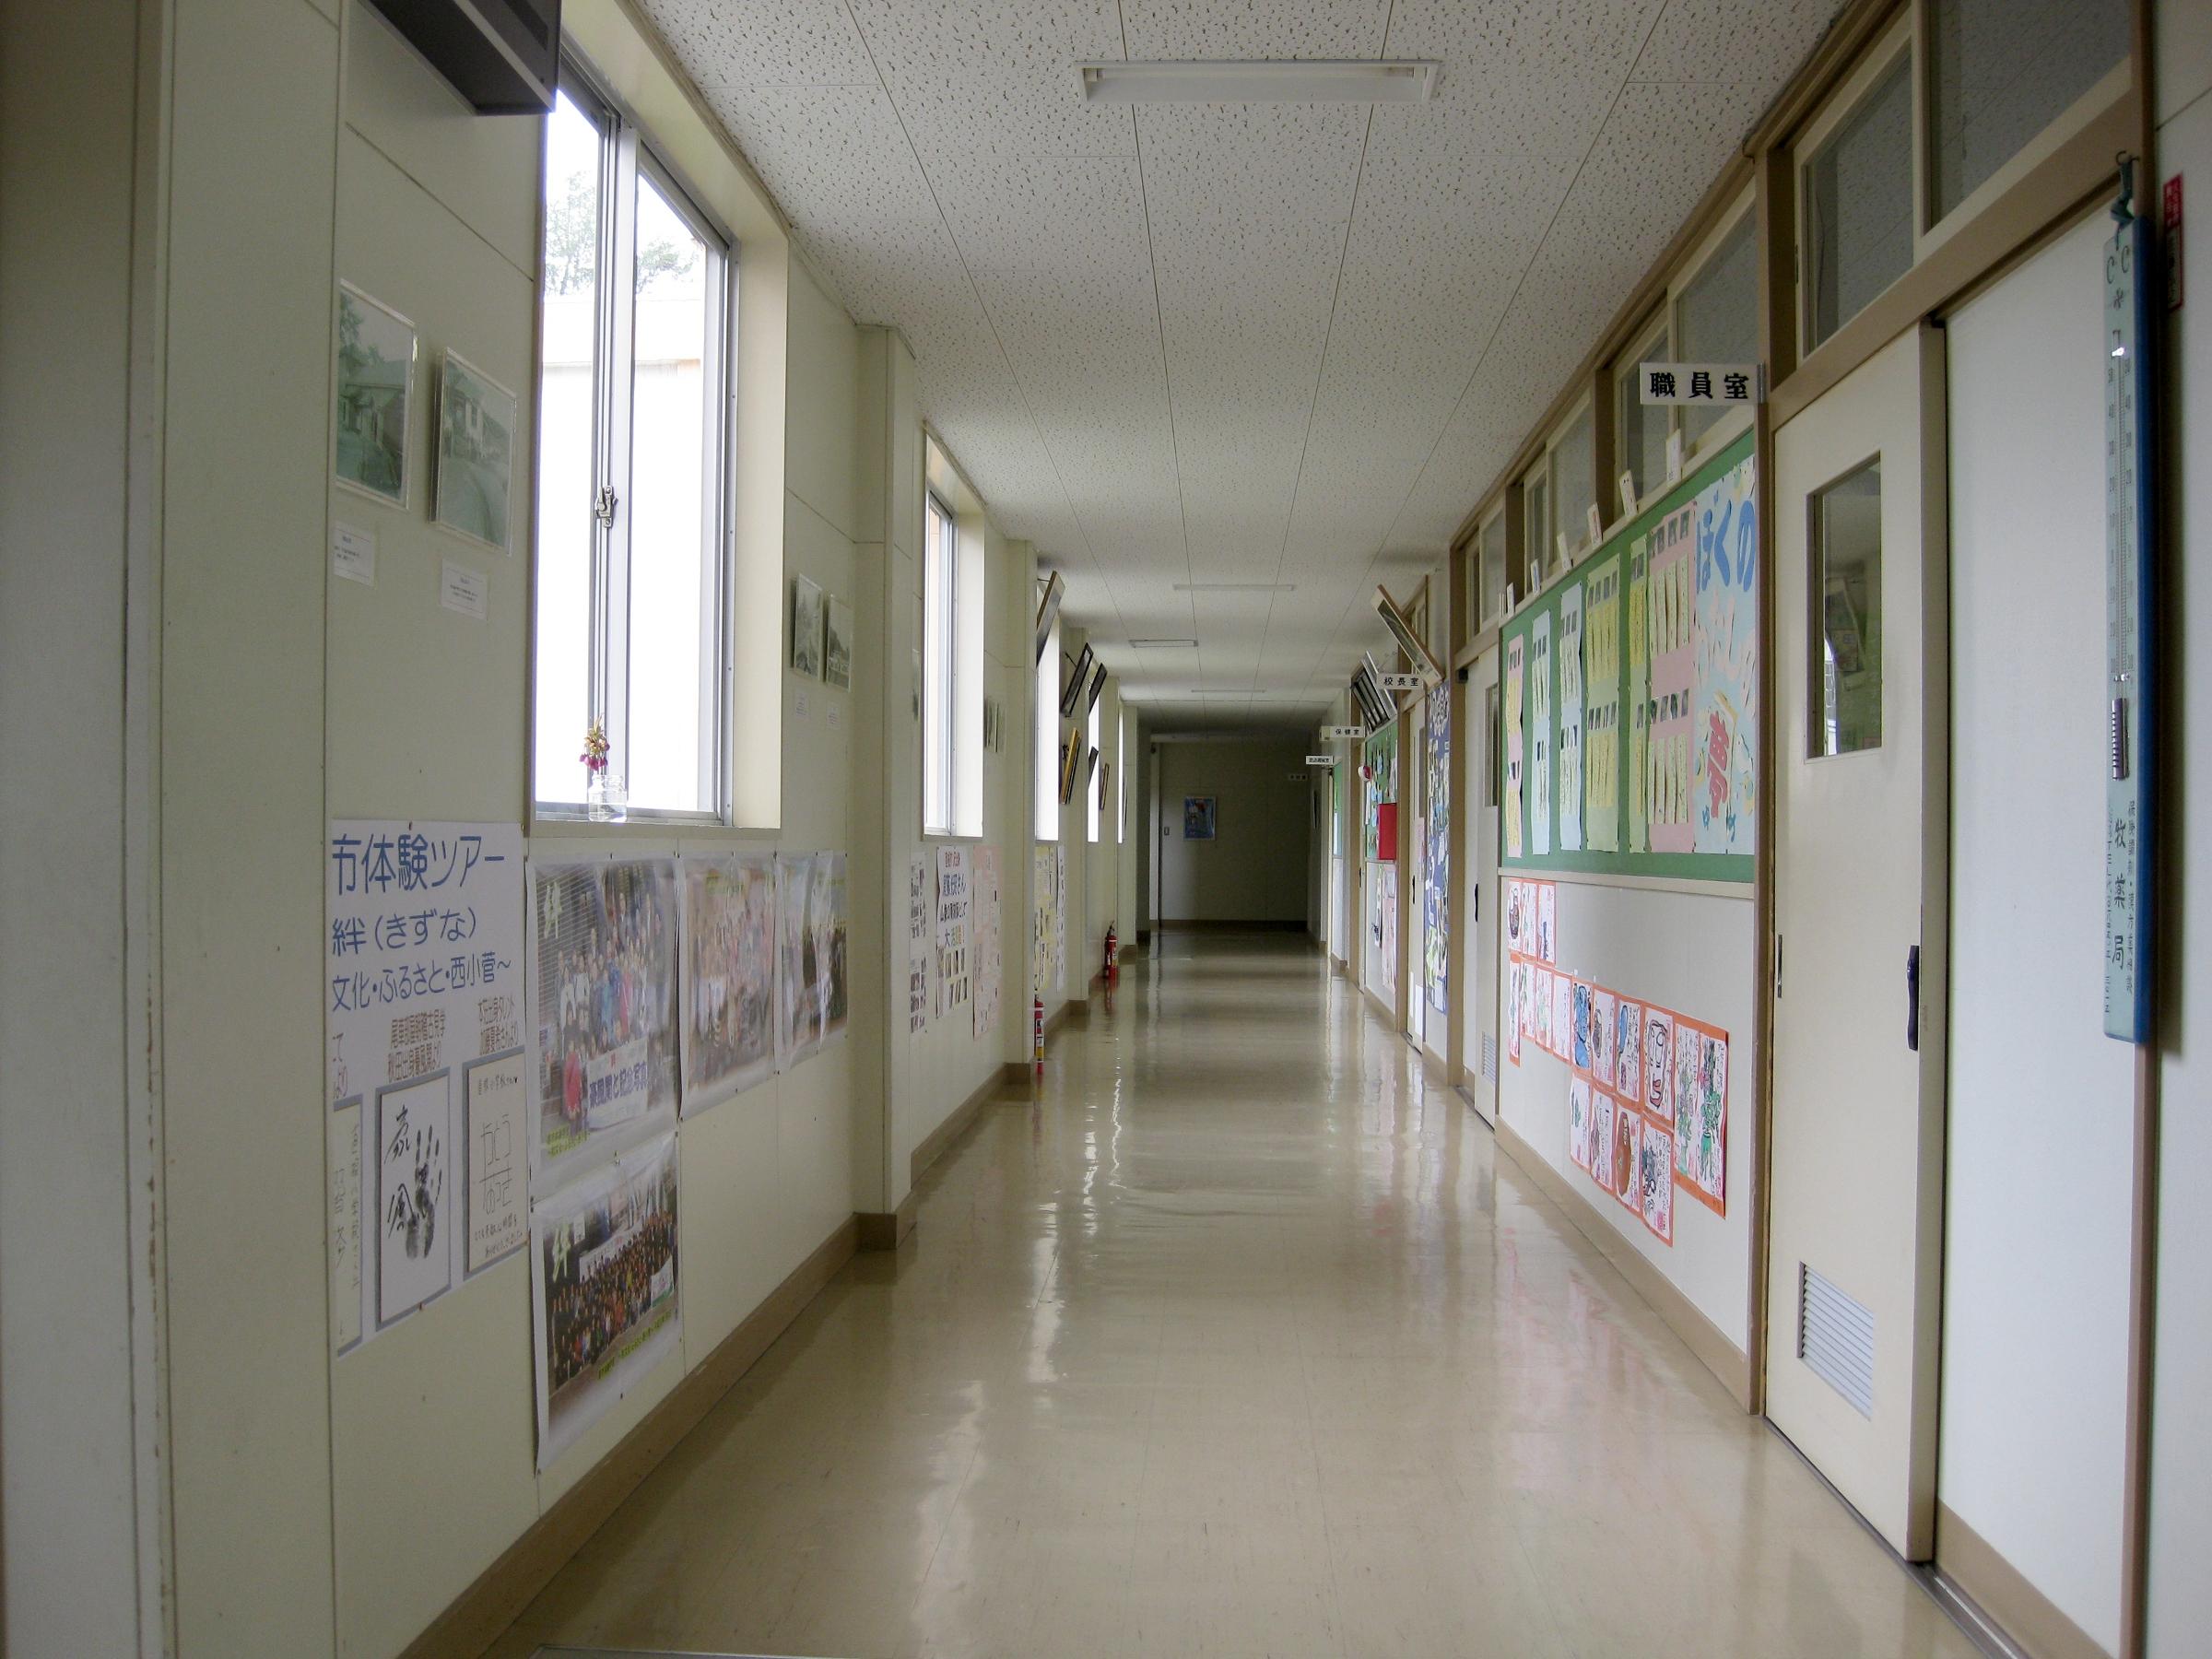 File:Hitane Elementary School hallway 1.jpg